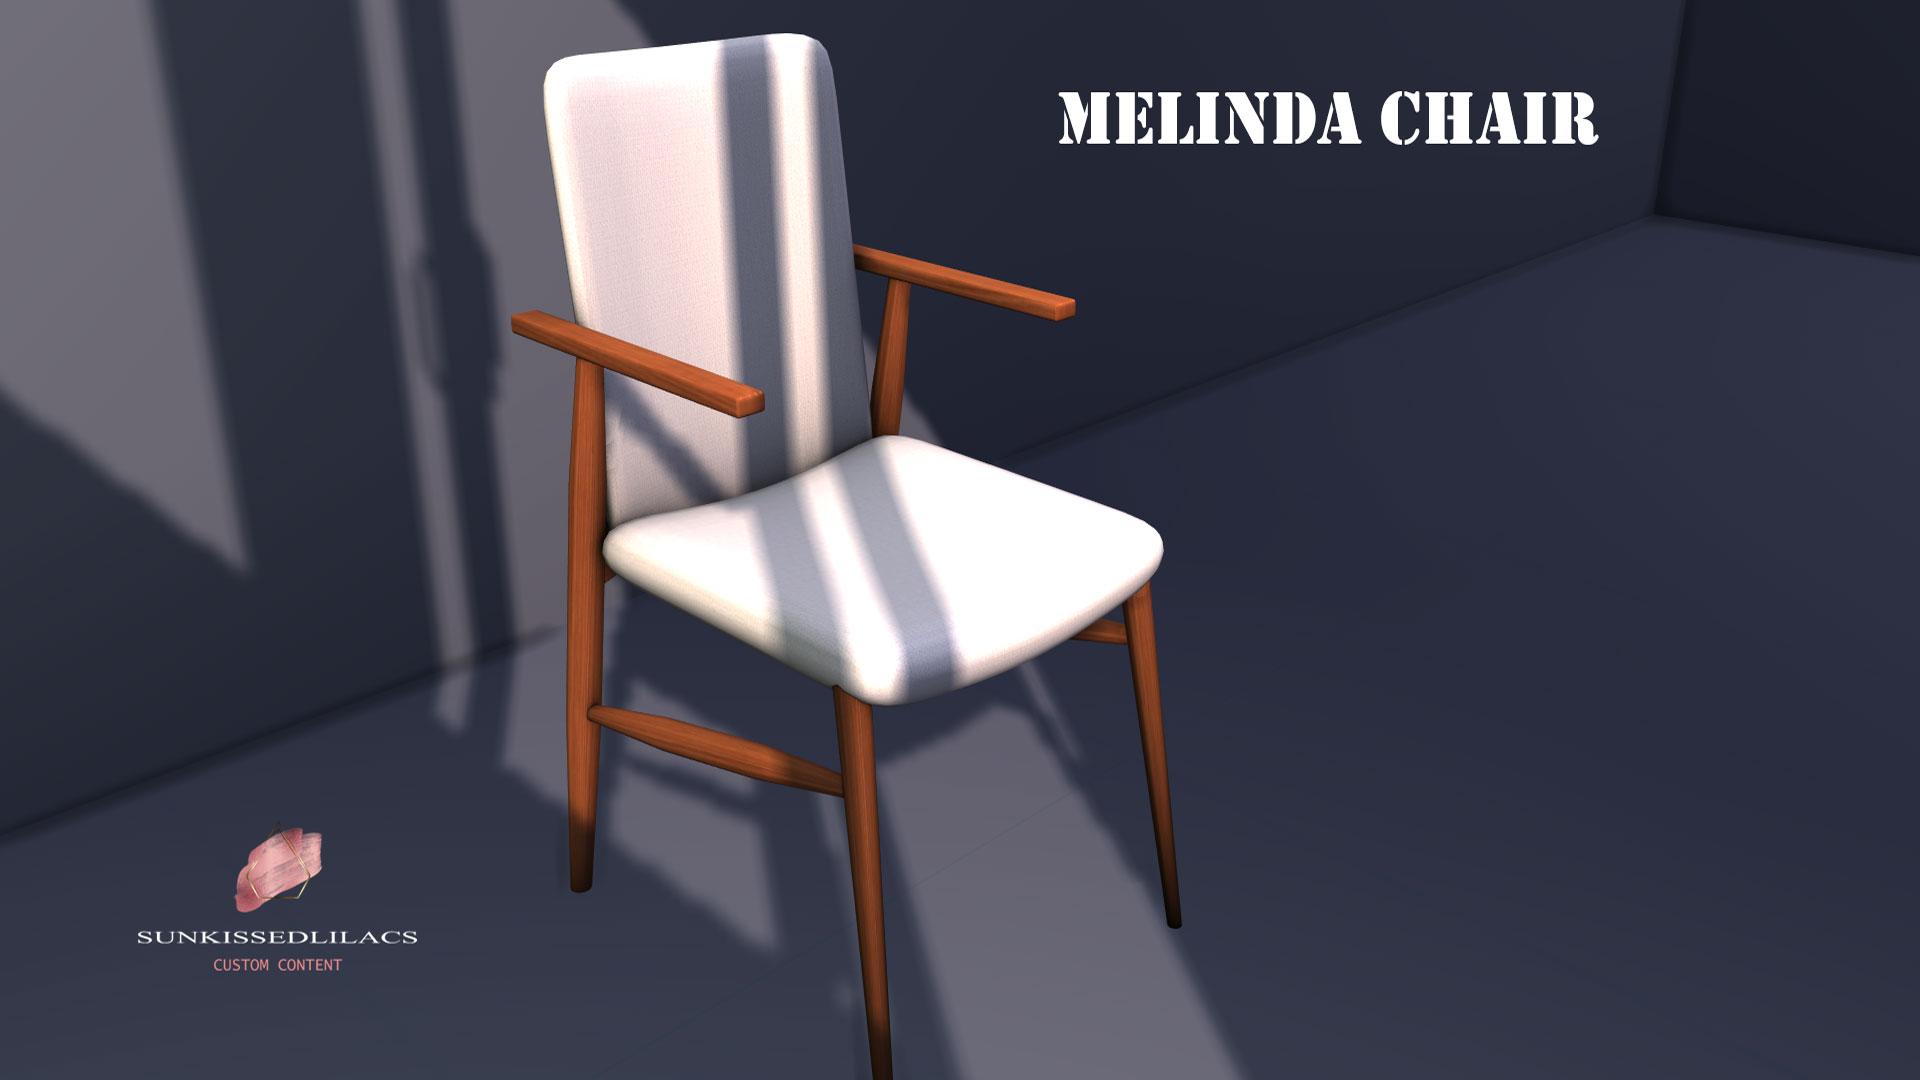 Melinda Chair sunkissedlilacs-simms-4-custom-content